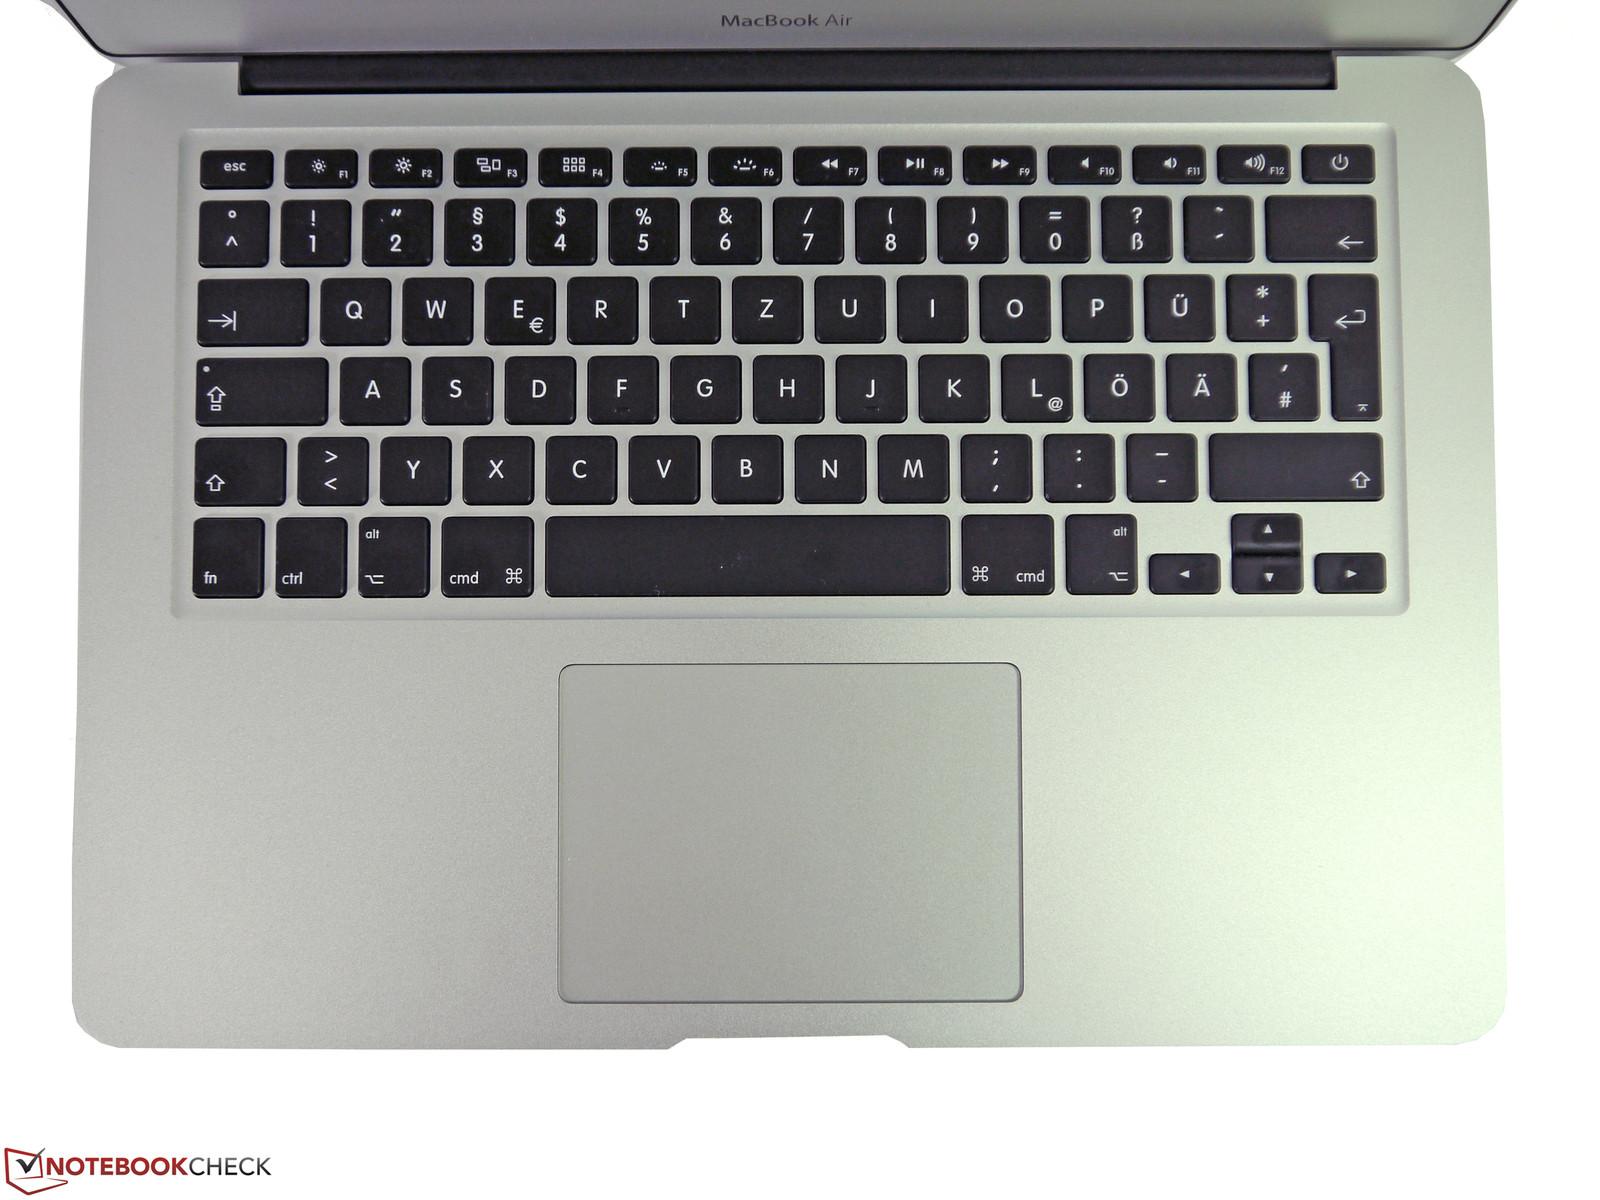 Macbook Pro Laptop Keyboard Layout Diagram